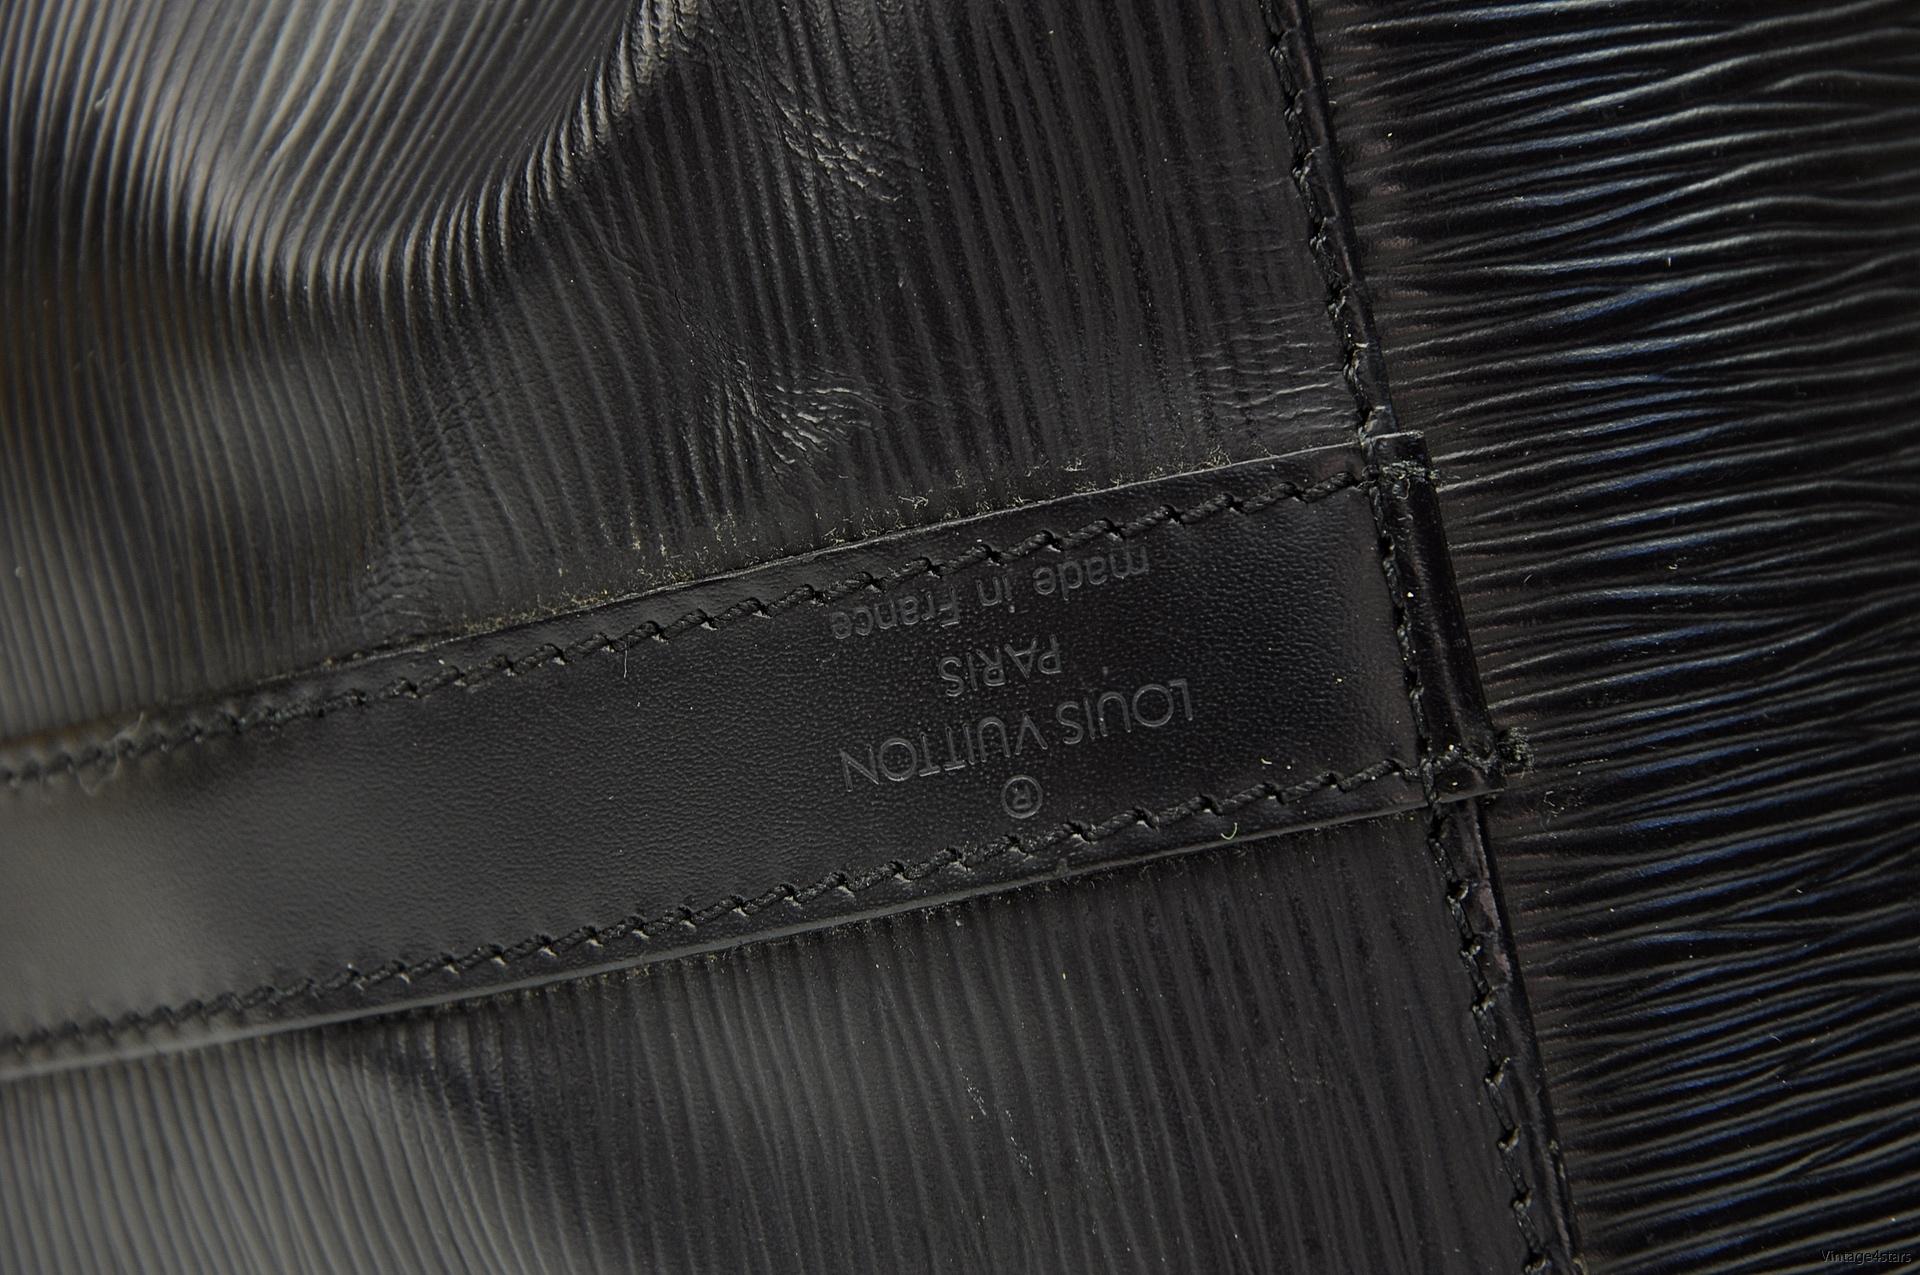 Louis Vuitton Petit Noe Epi 4